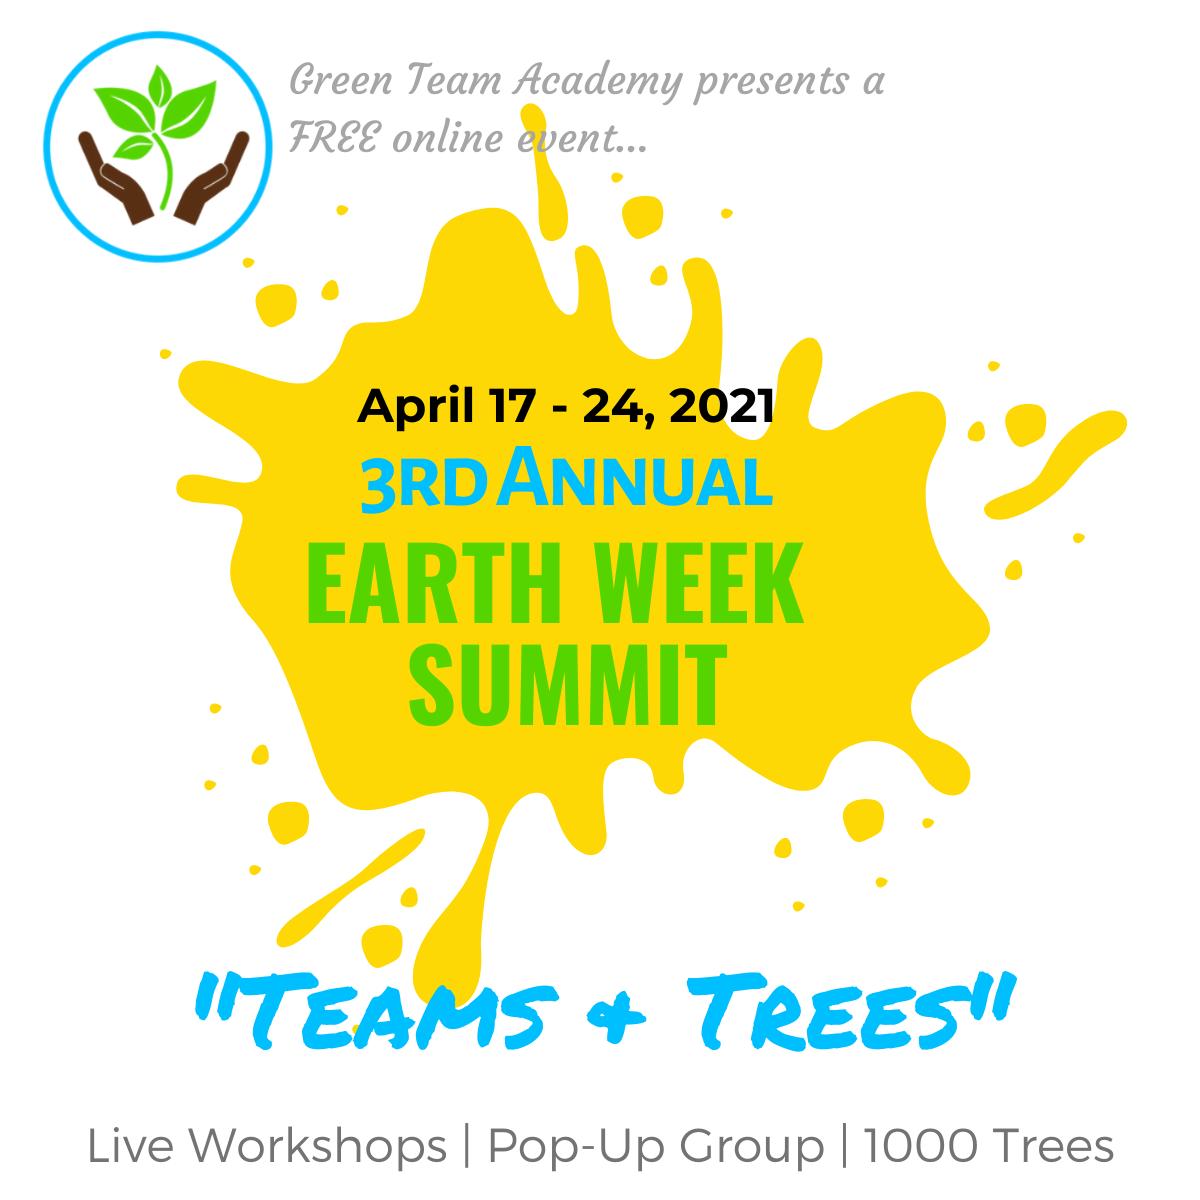 Earth Week Summit advertisement